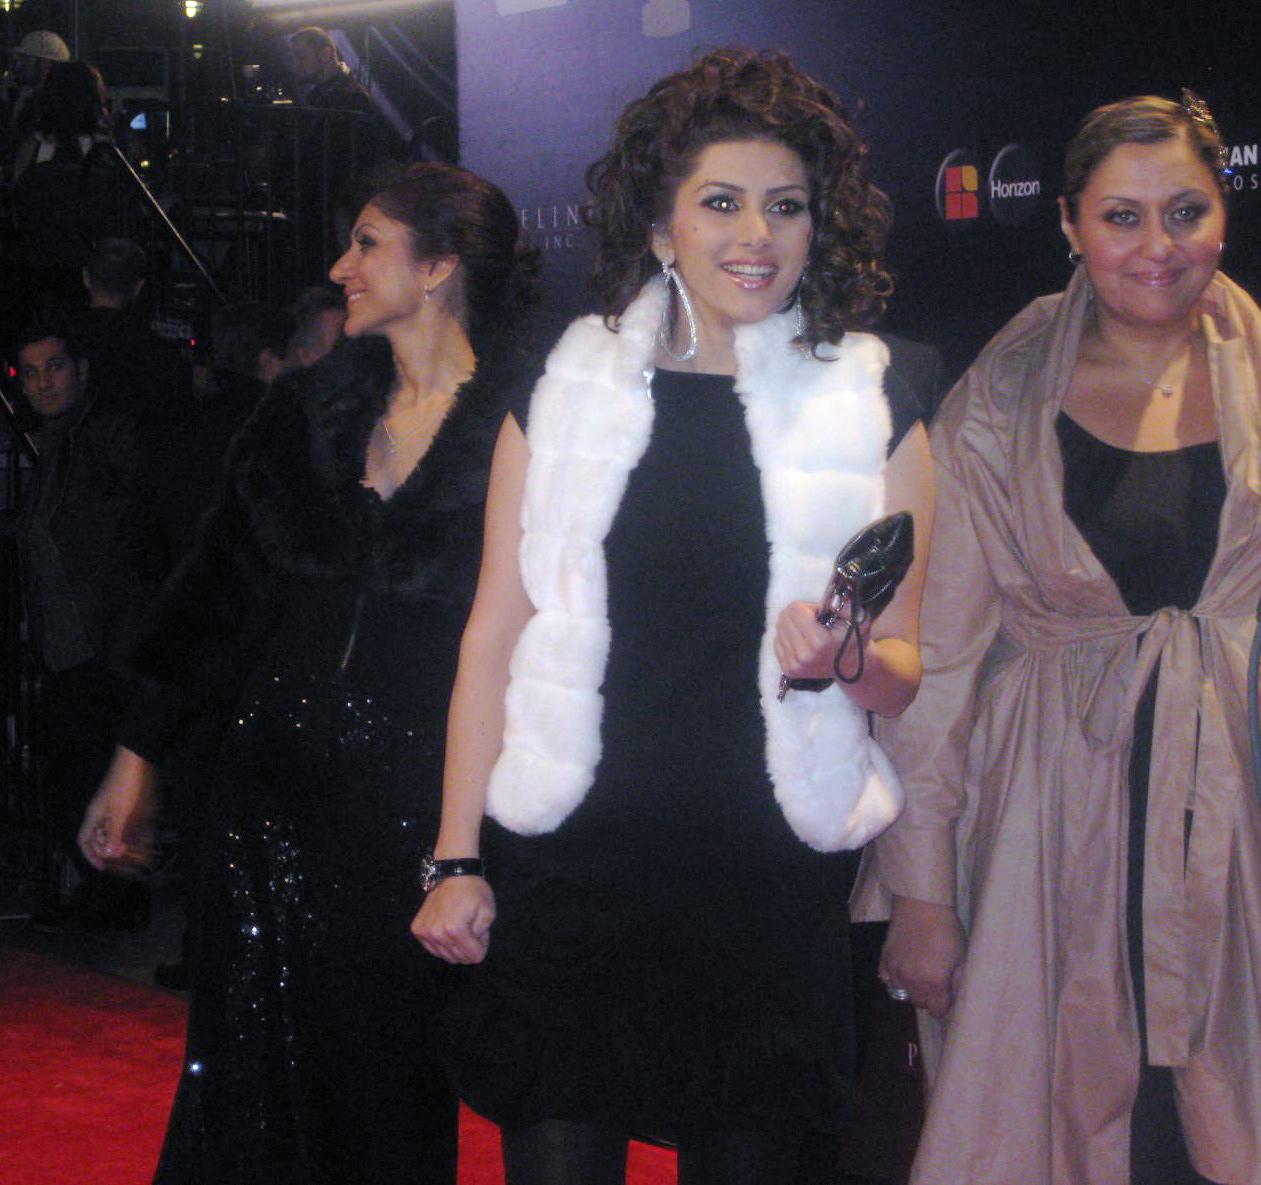 Nune Yesayan, Sofi Mkheyan and Shushan Petrosyan